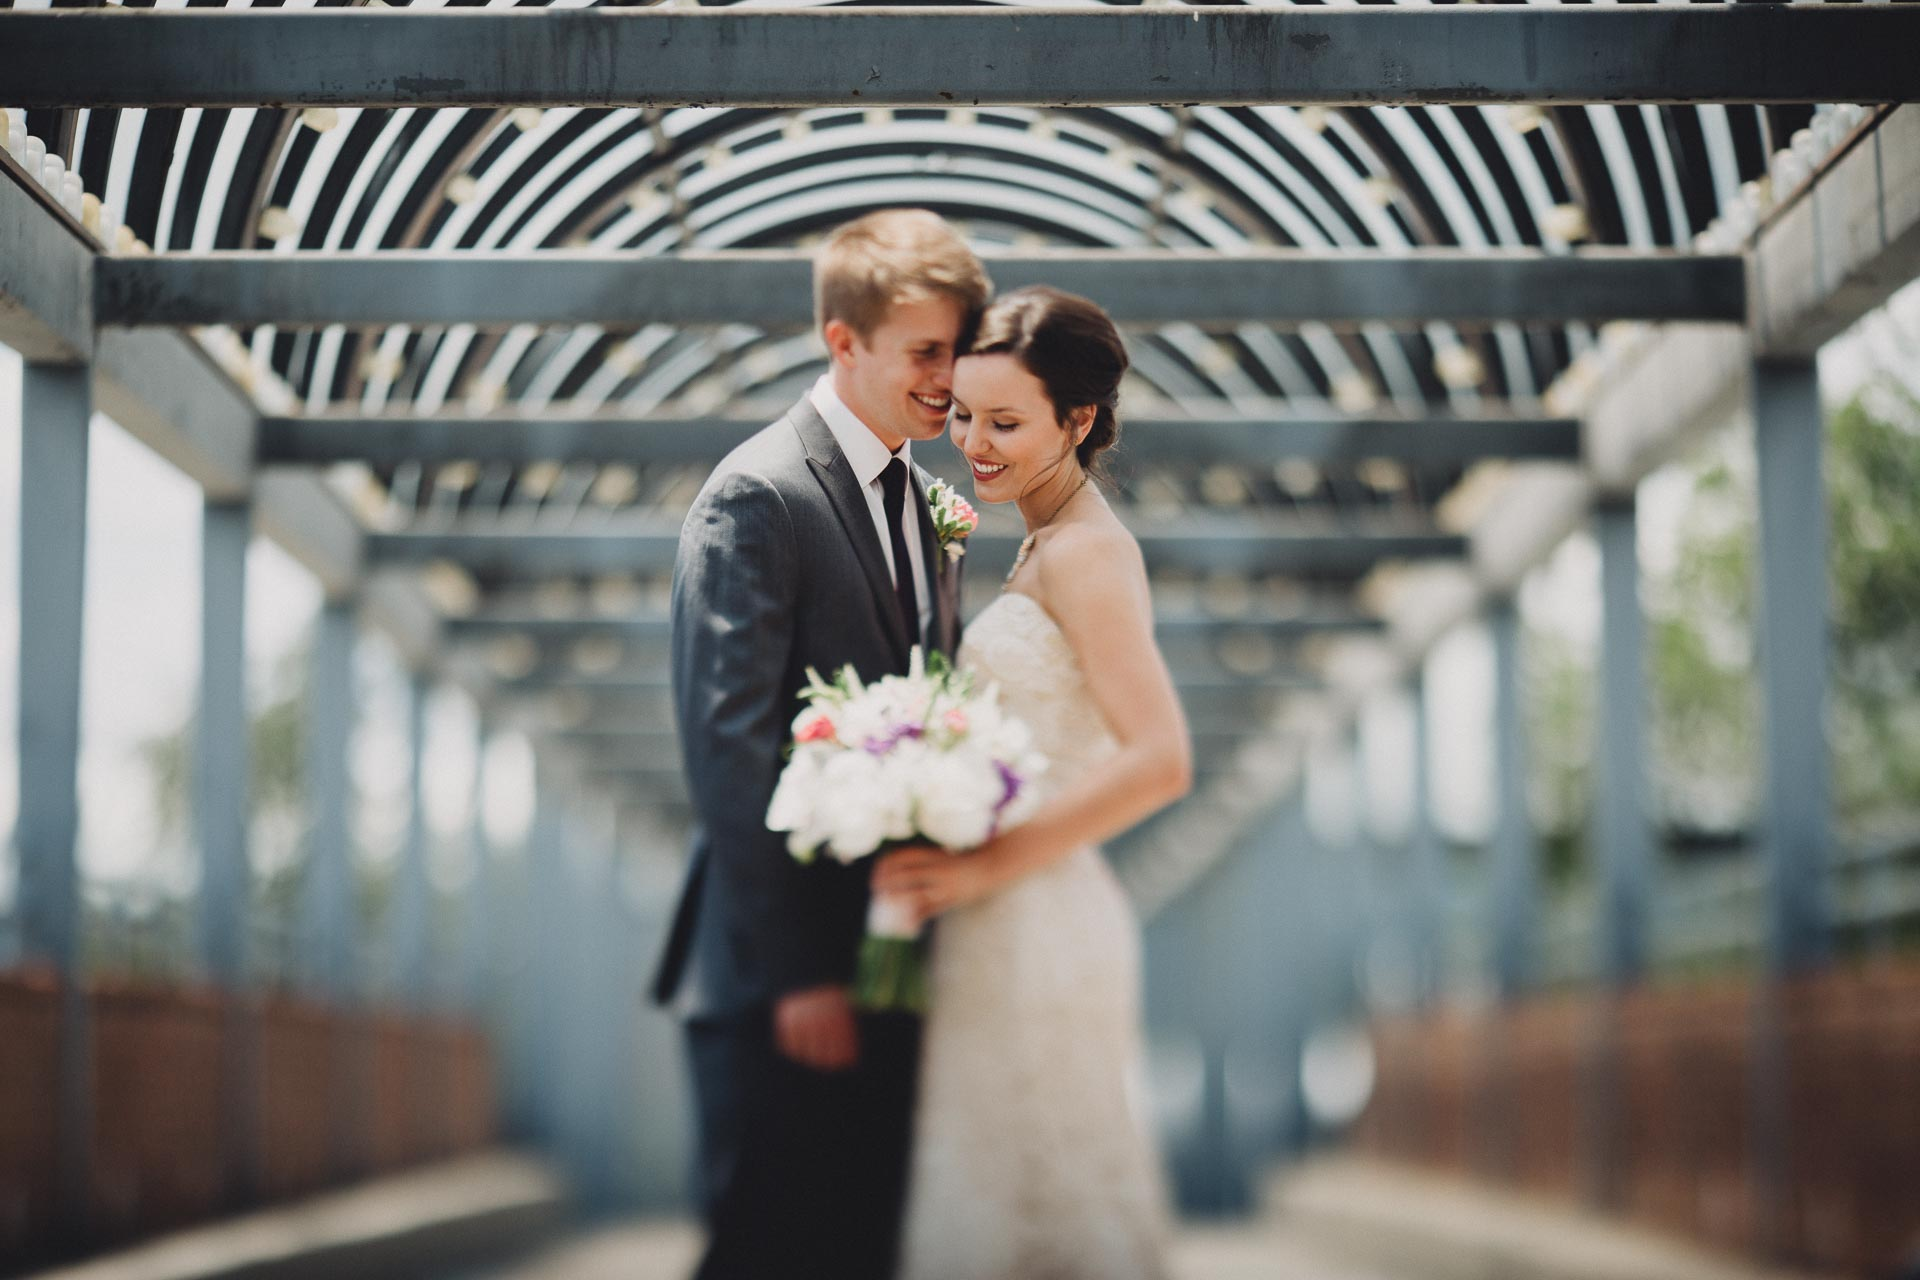 Julia-Michael-Cincinnati-Music-Hall-Wedding-060@2x.jpg